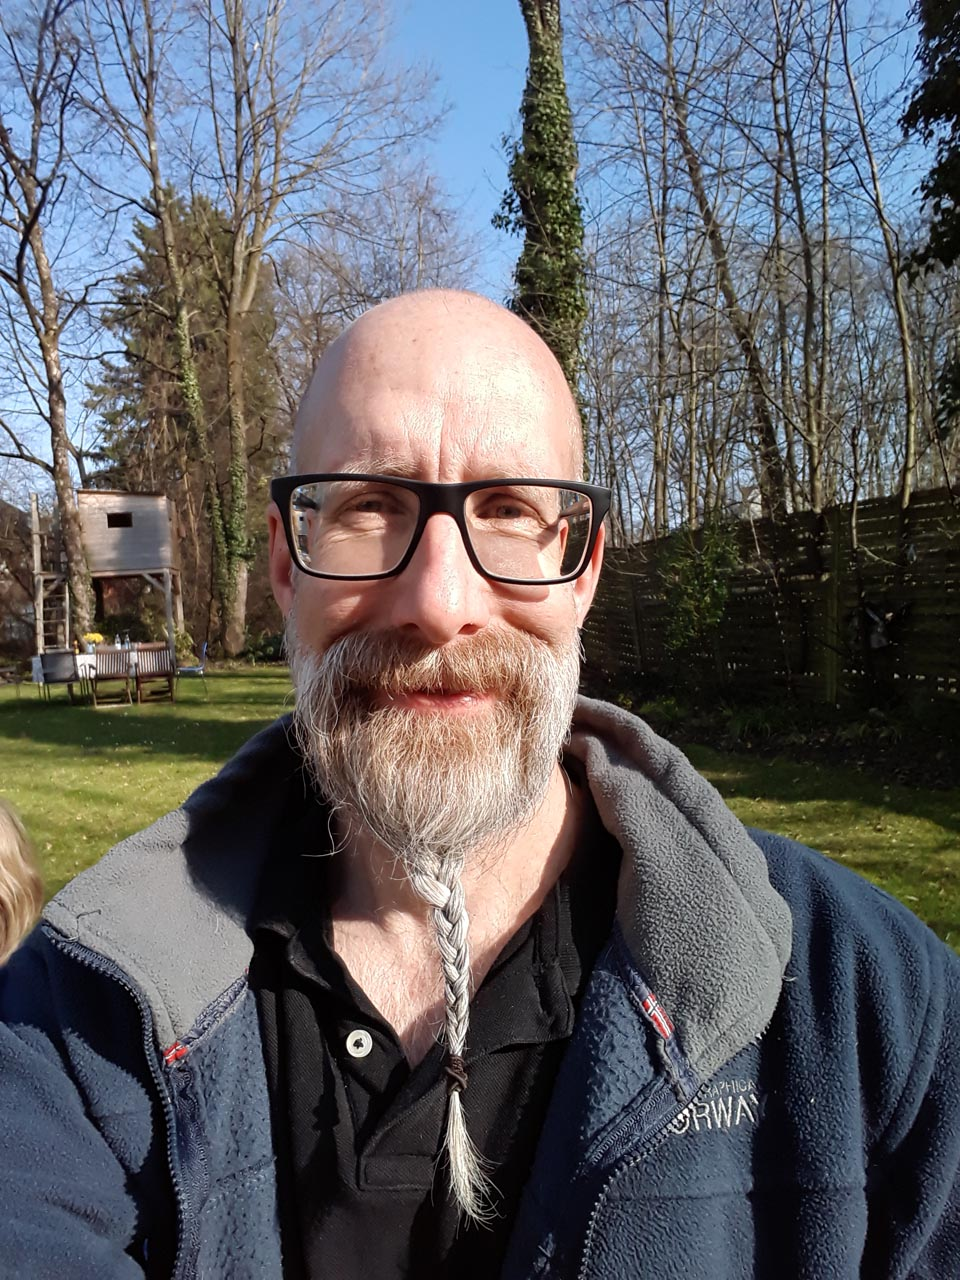 Leben im Tiny Dorf: Initiator Thorsten Thane